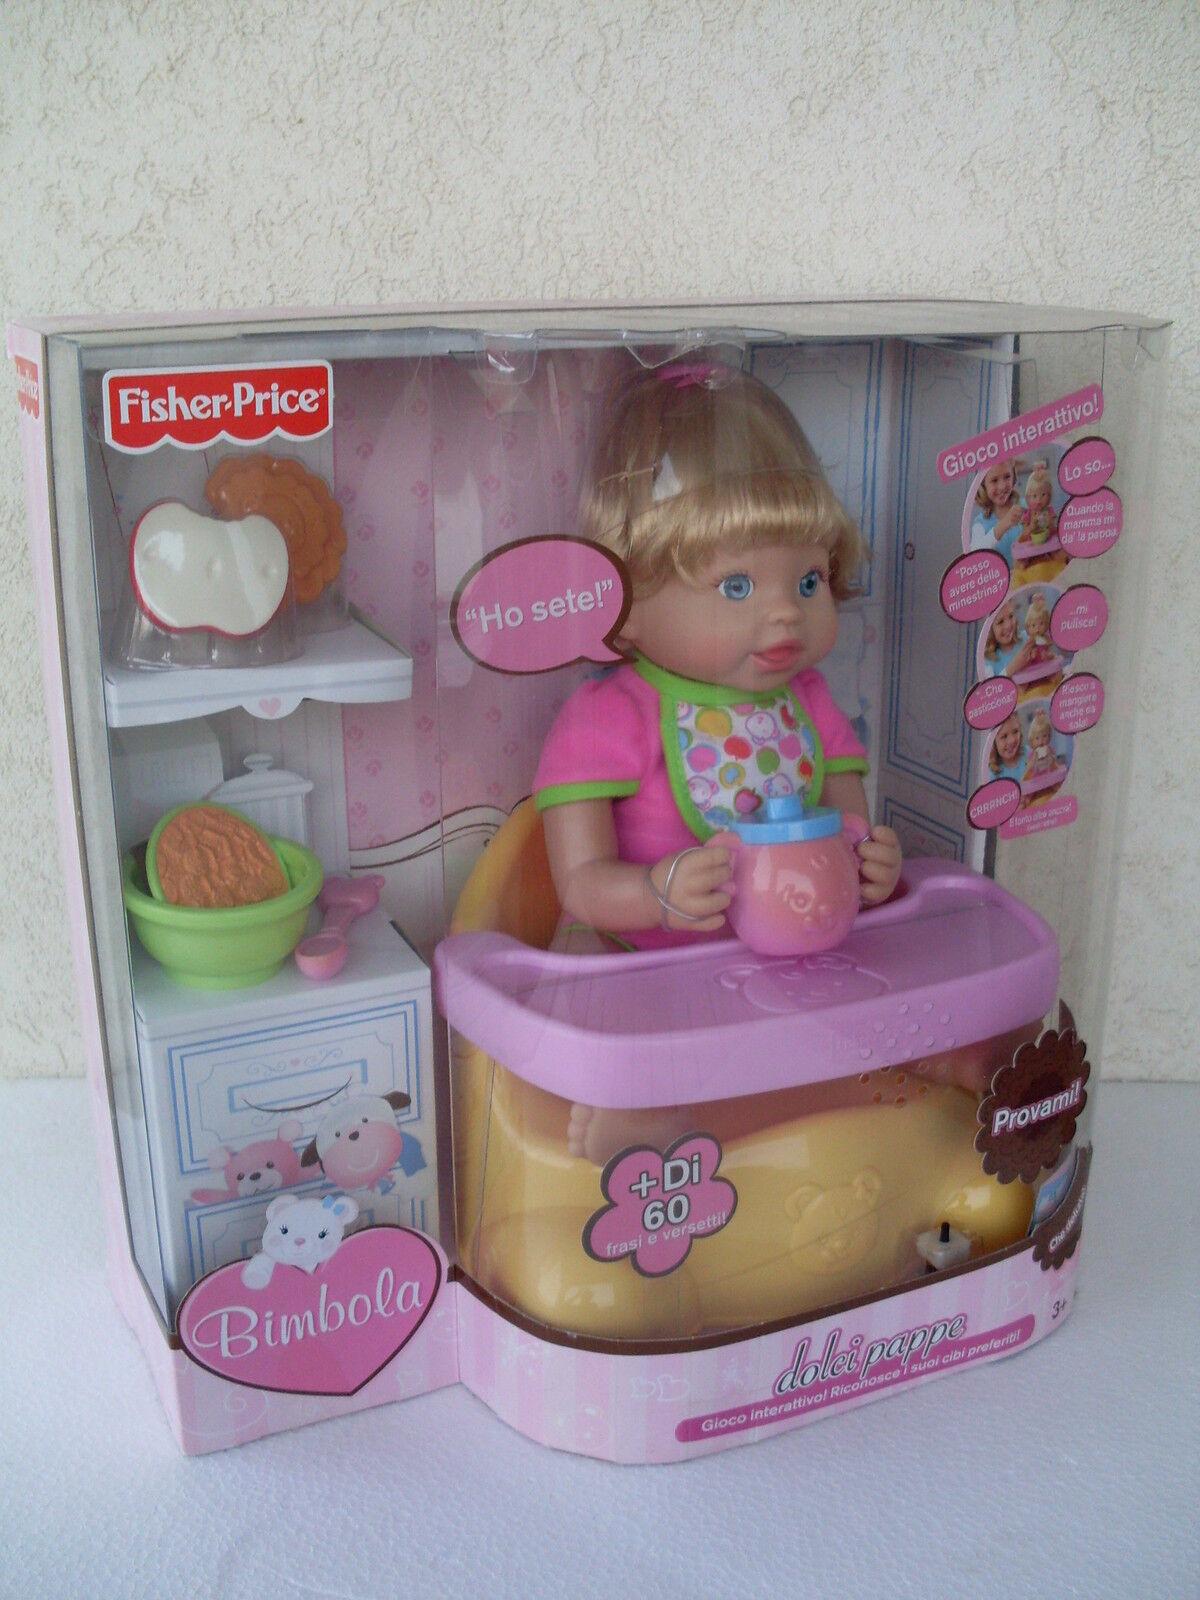 Bimbola dolci pappe interactive doll bambola muneca poupèe ok fisher fisher fisher price T1272 e84bf6